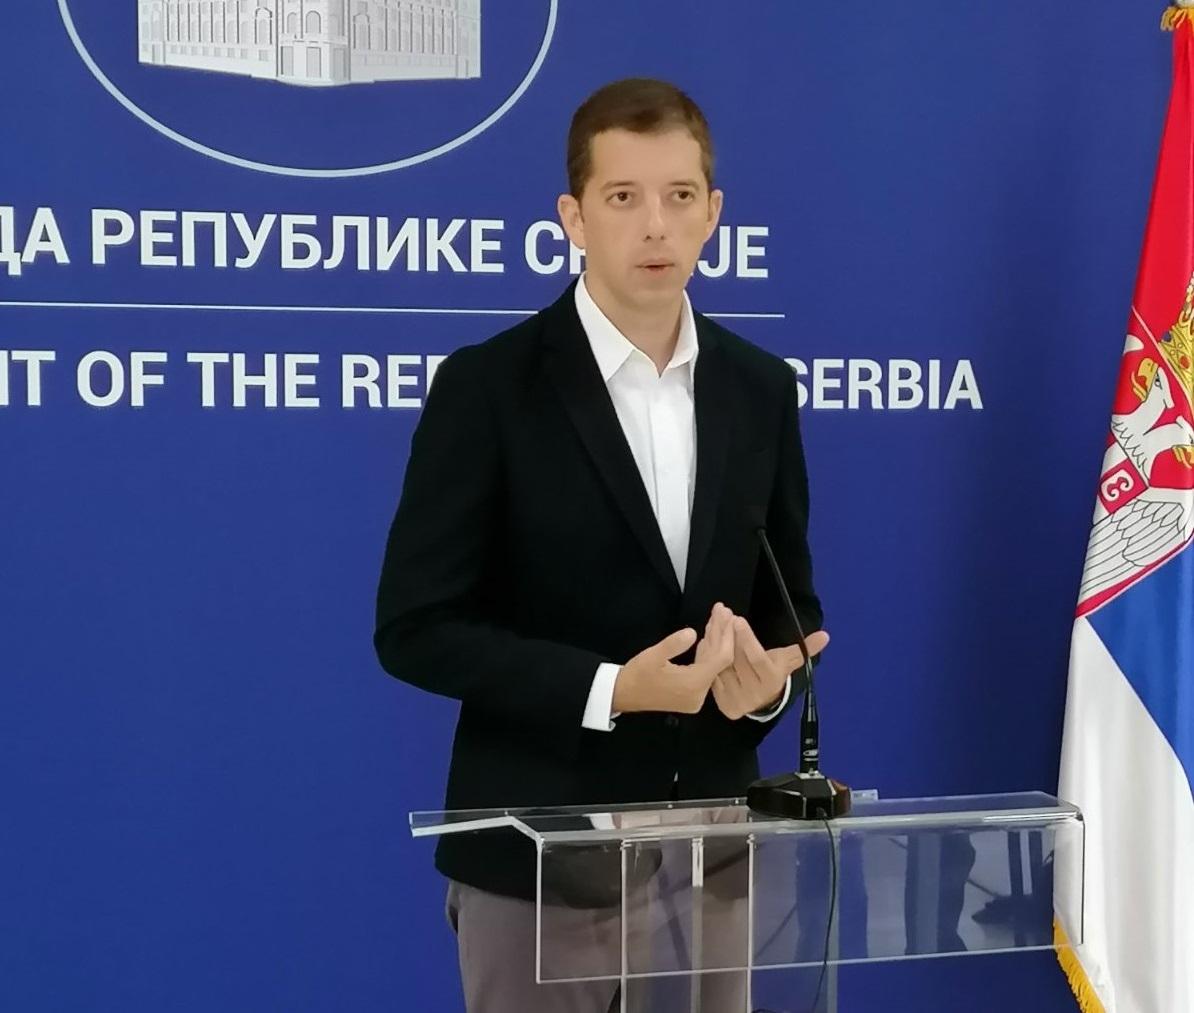 Đurić zahteva hitno identifikovanje i hapšenje osoba koje su večeras potegle vatreno oružje na srpsku decu